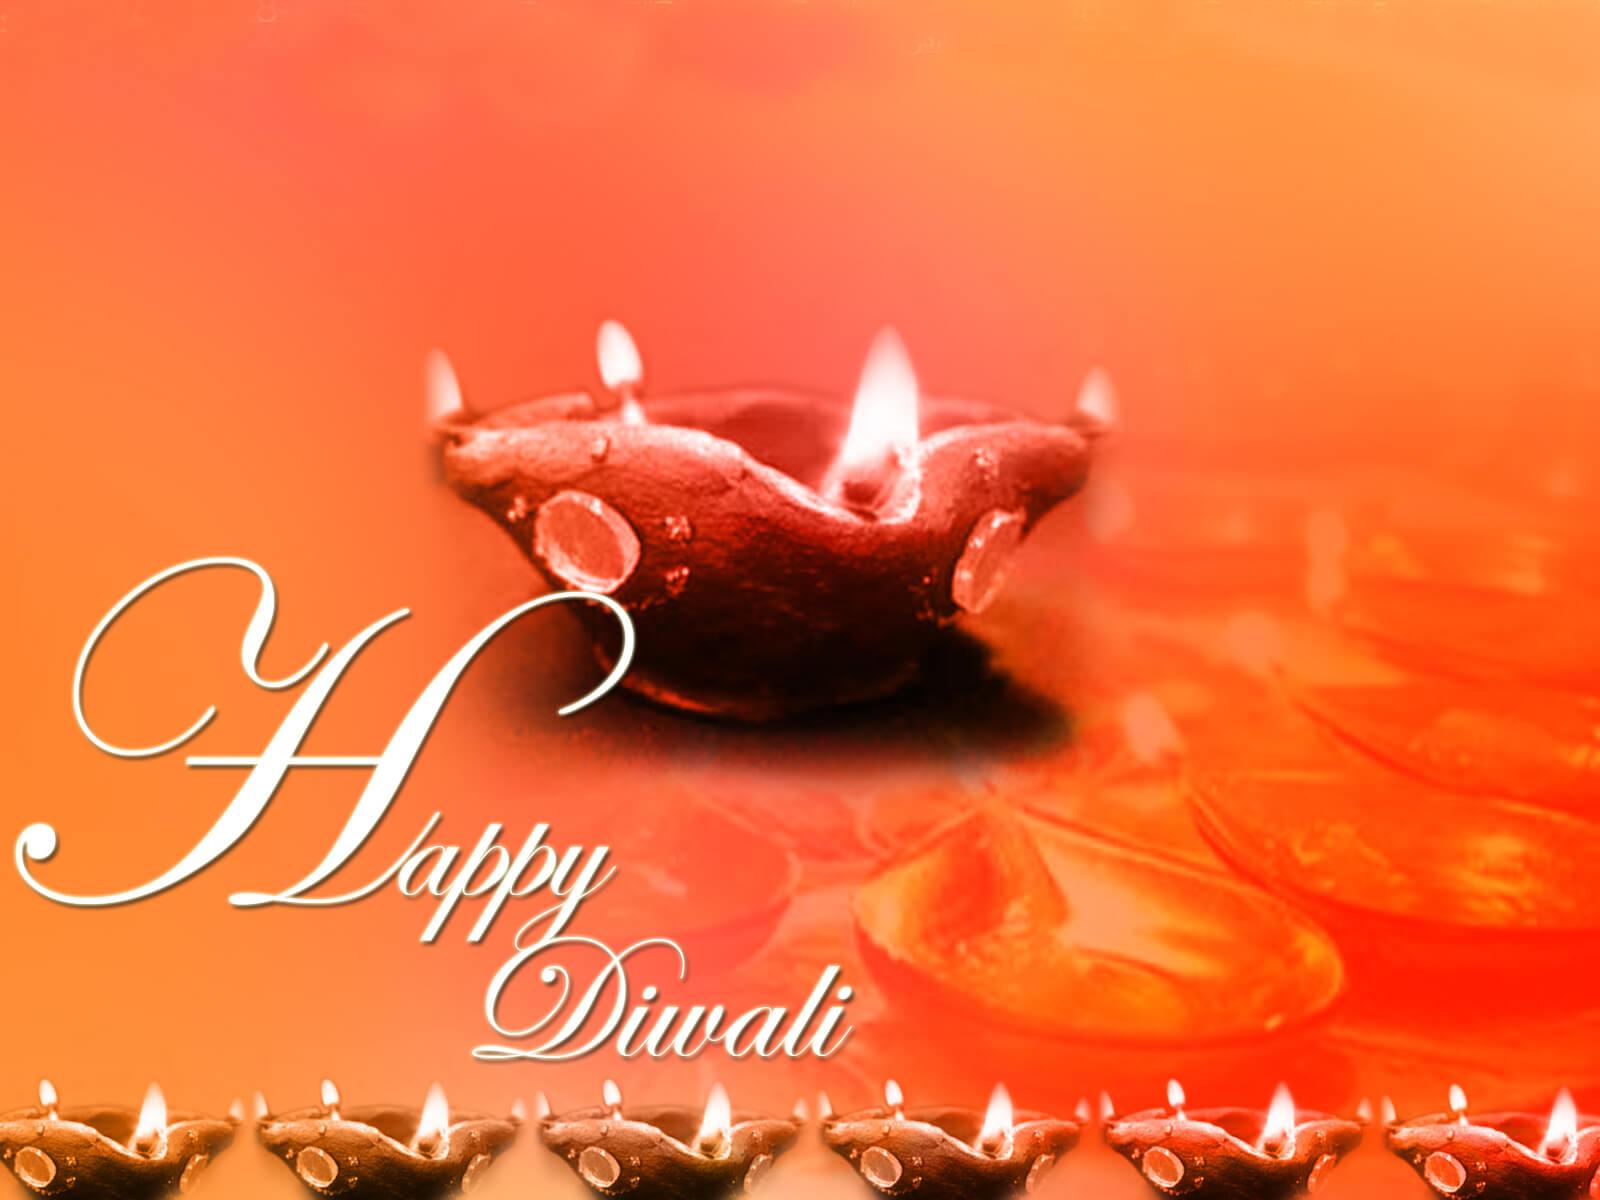 Download-Happy-Diwali-2015-HD-Wallpapers-facebook-mobile-desktop-cgfrog-21